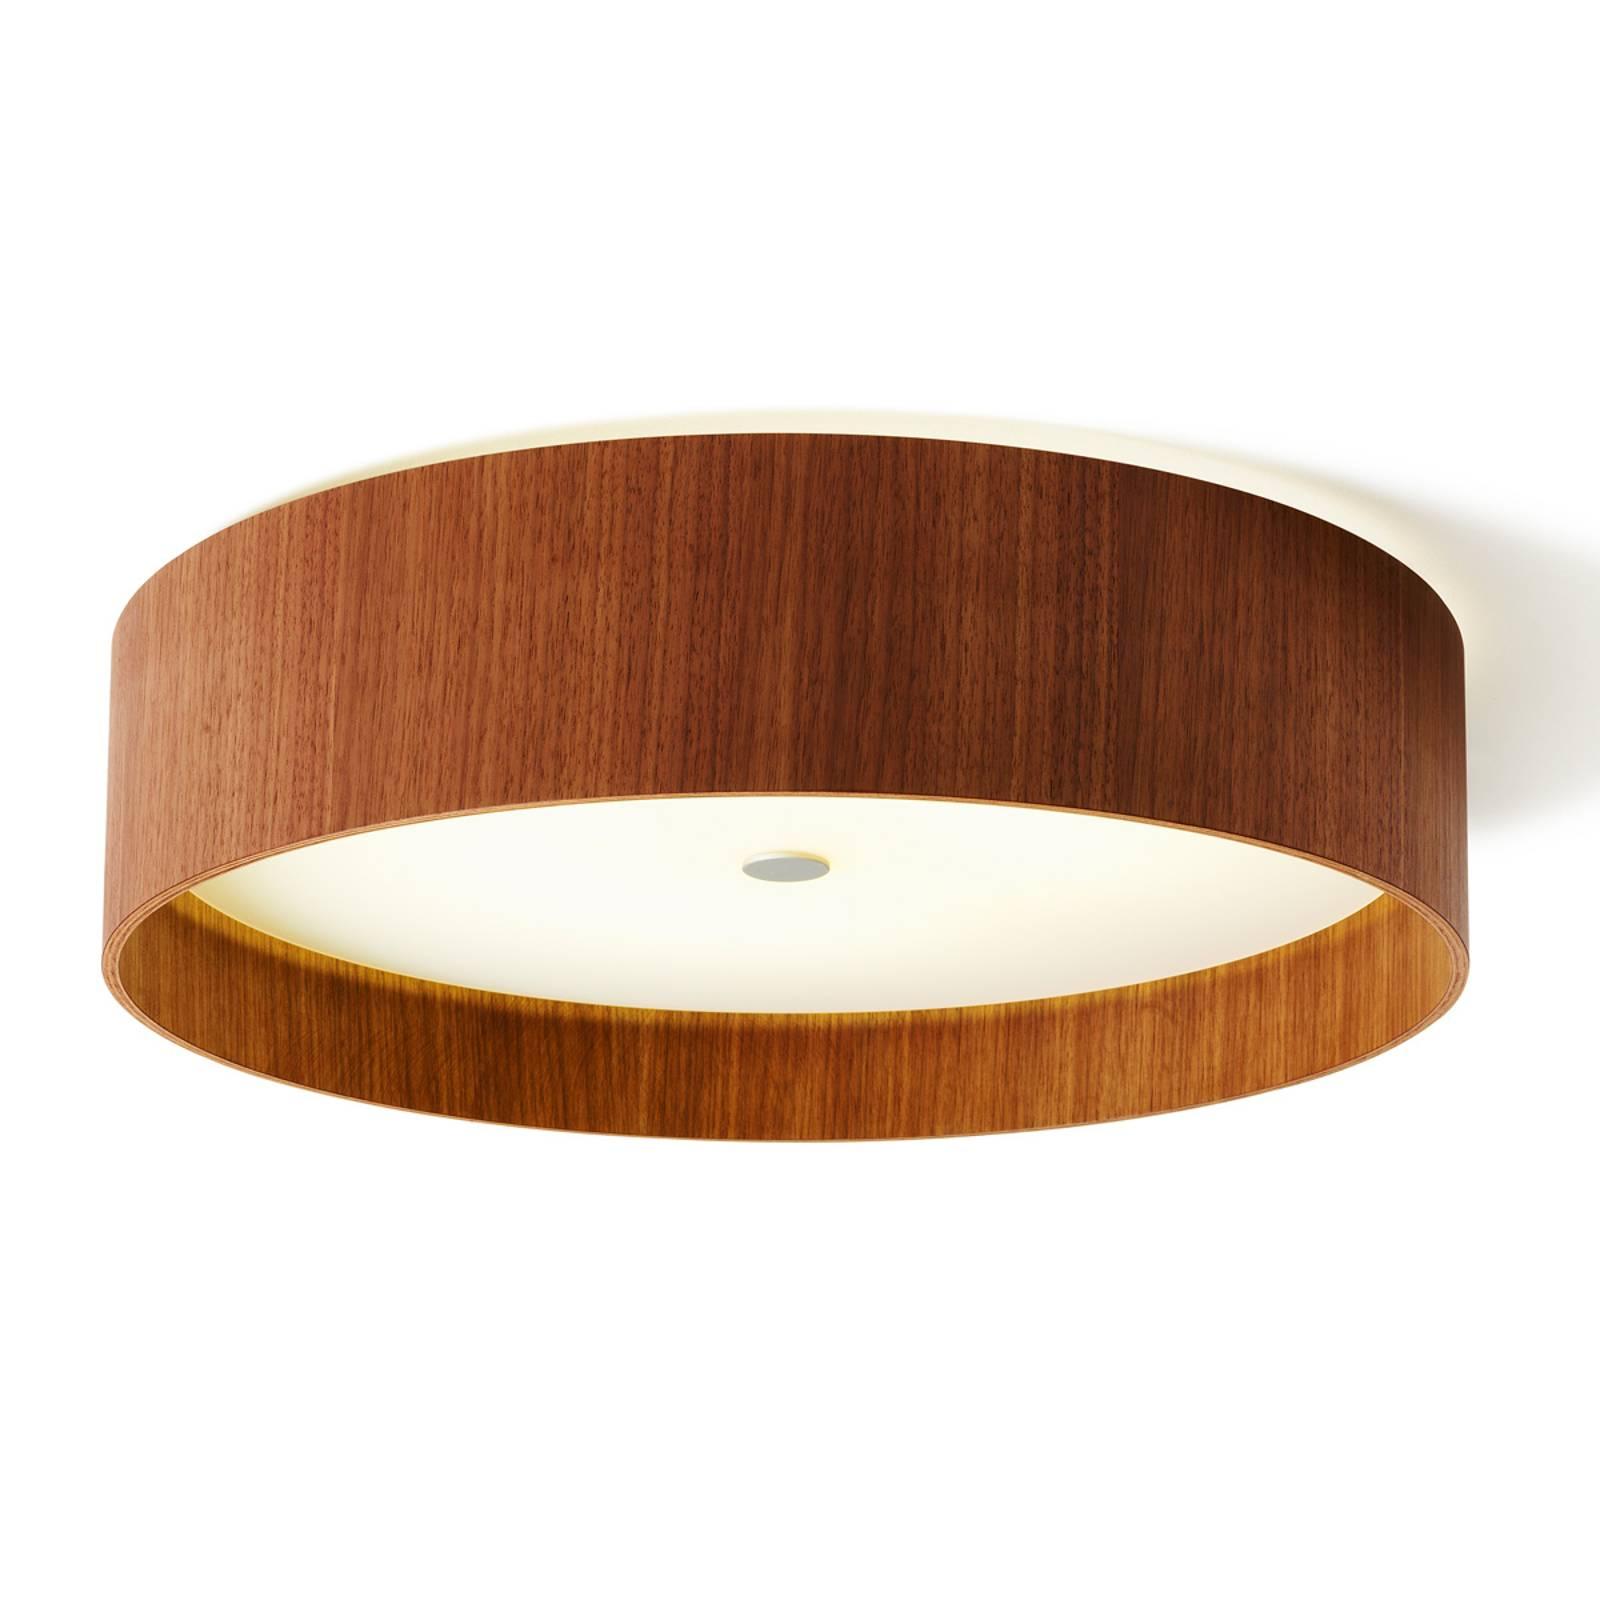 Lara wood - LED plafondlamp van notenhout, 55 cm